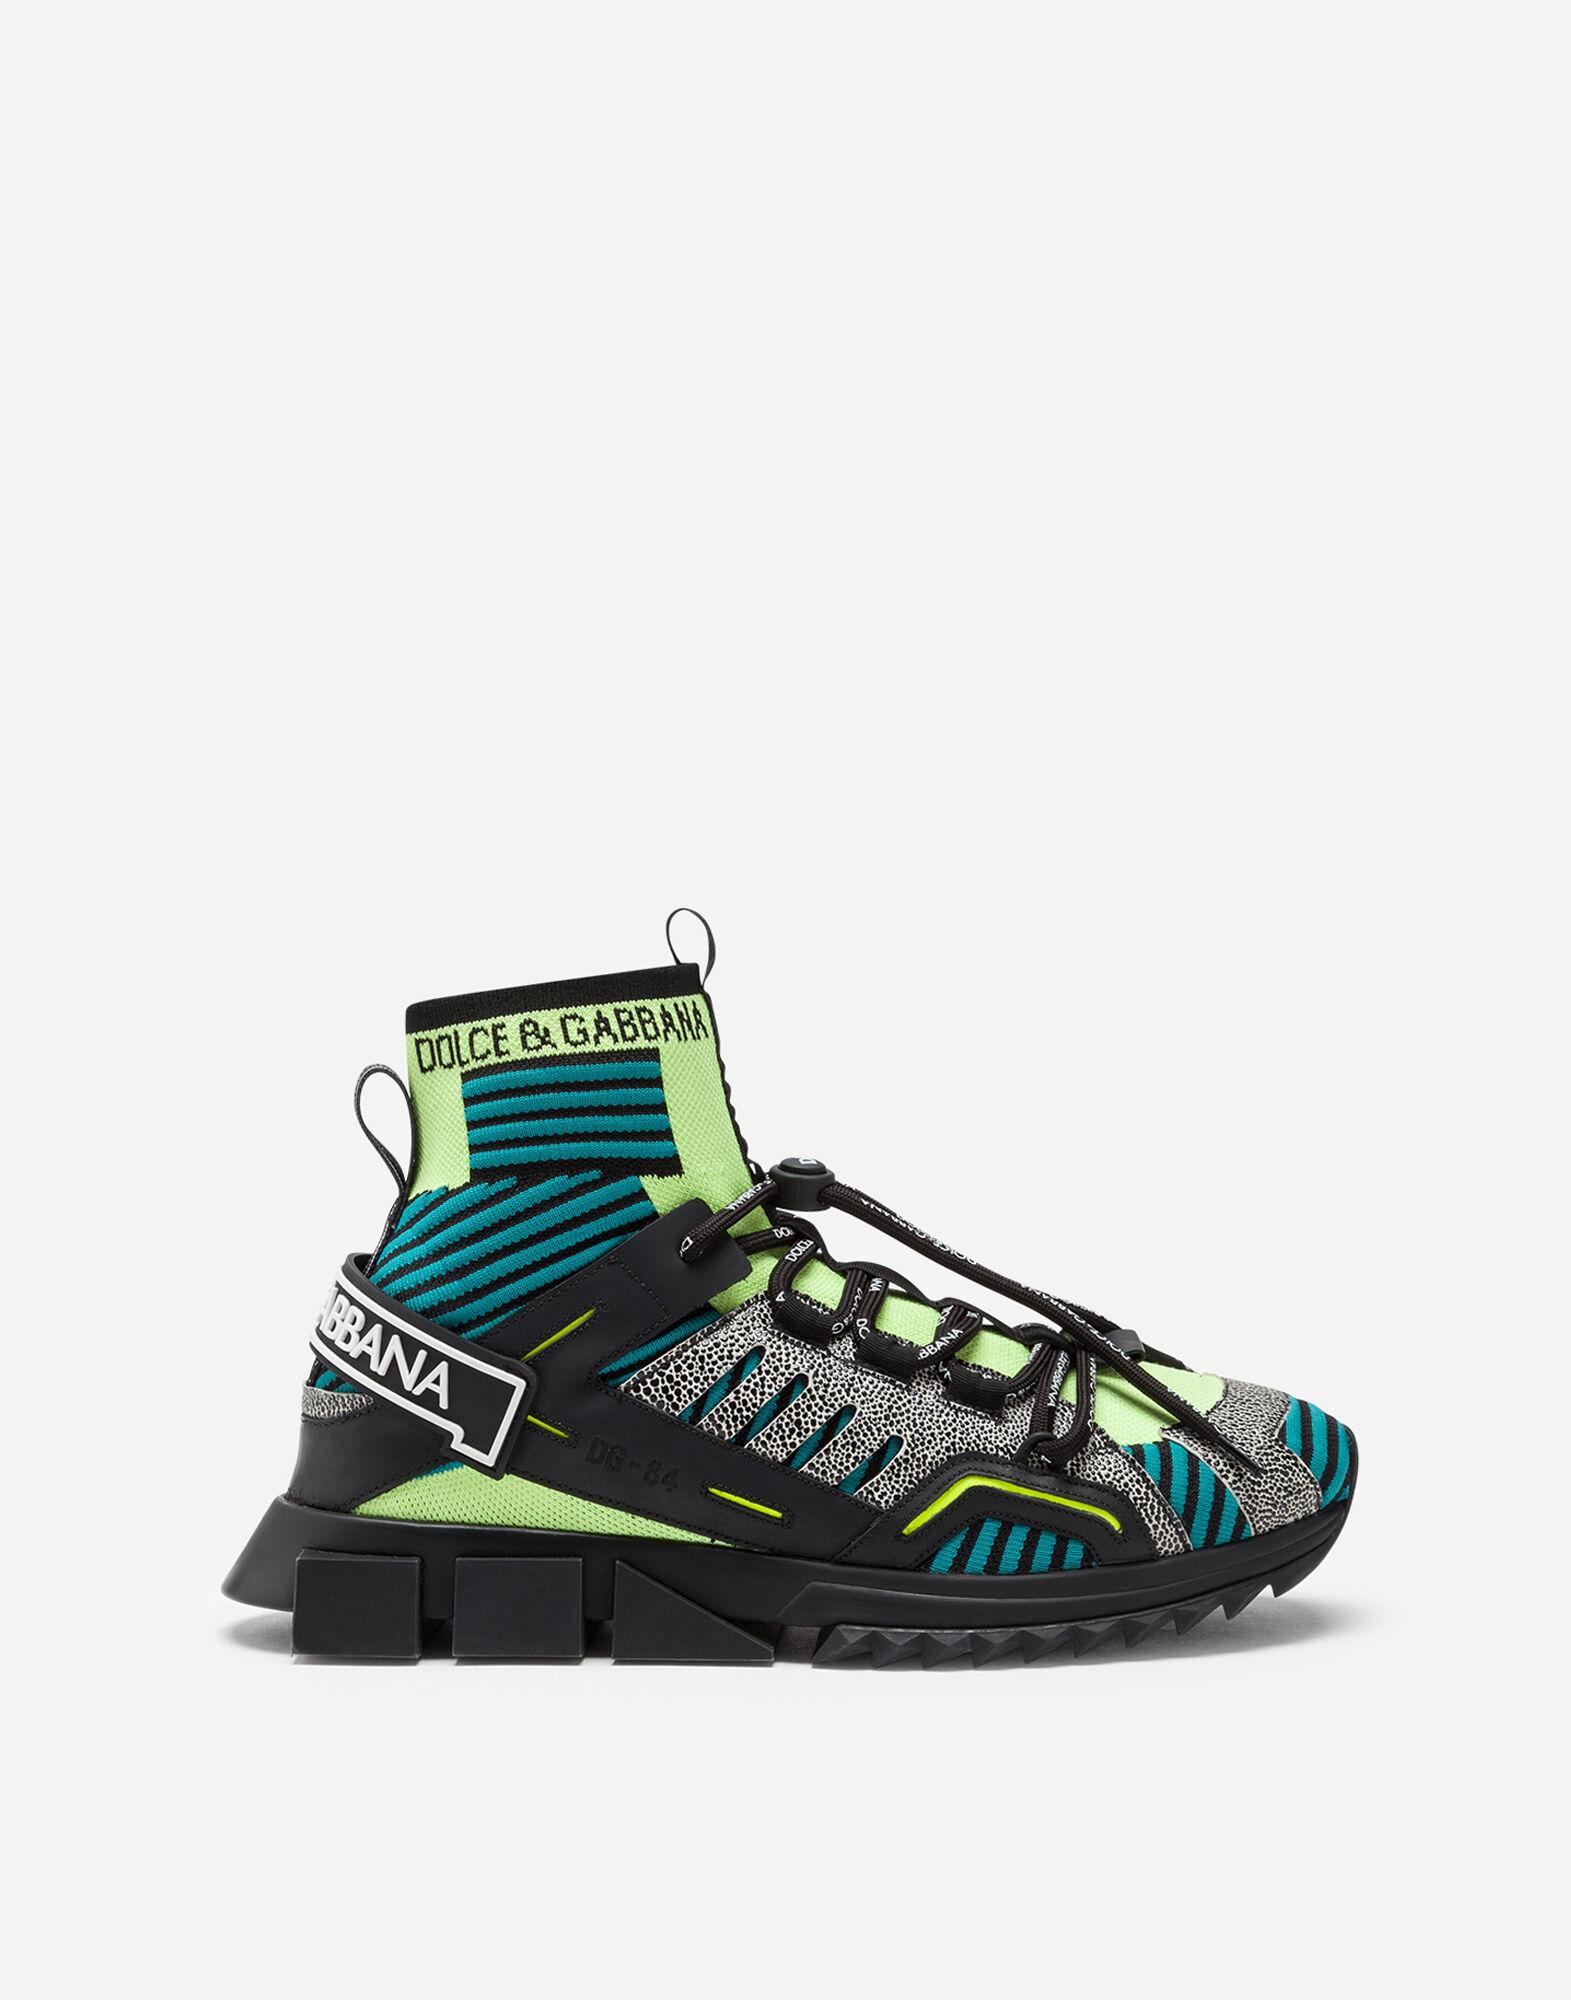 d&g high top sneakers